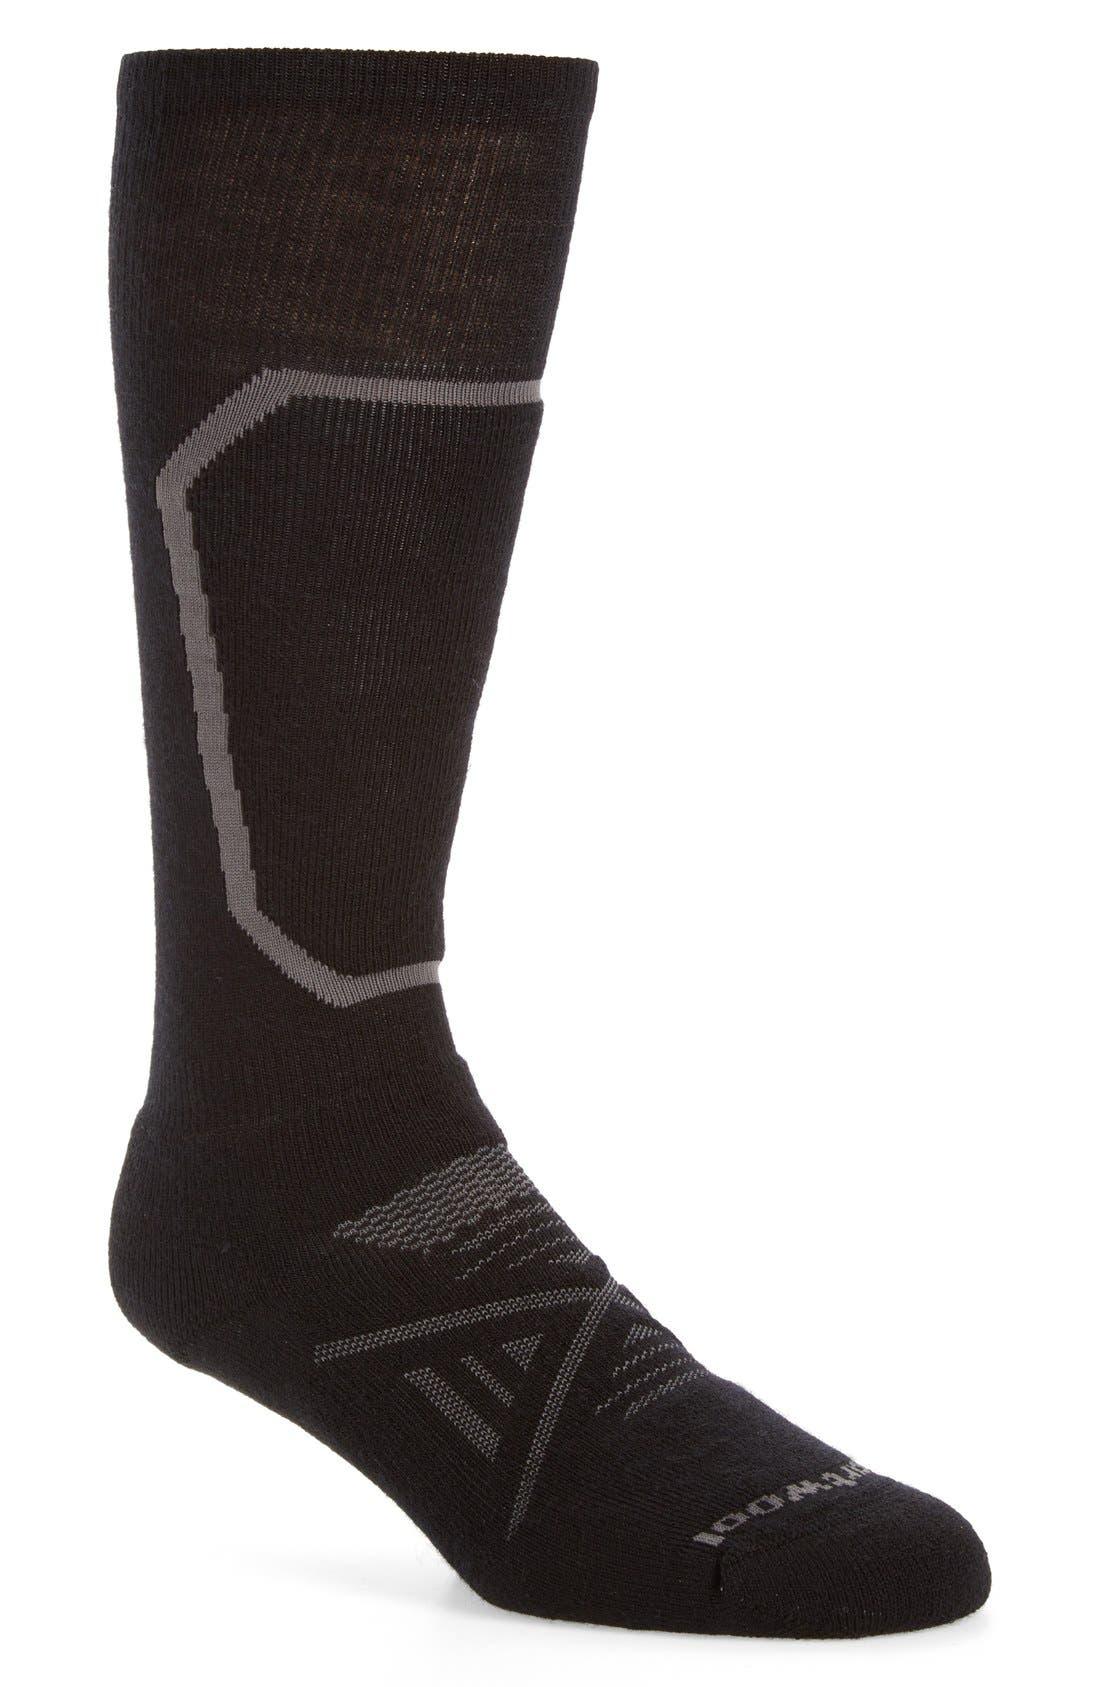 Main Image - Smartwool PhD® Ski Medium Over the Calf Socks